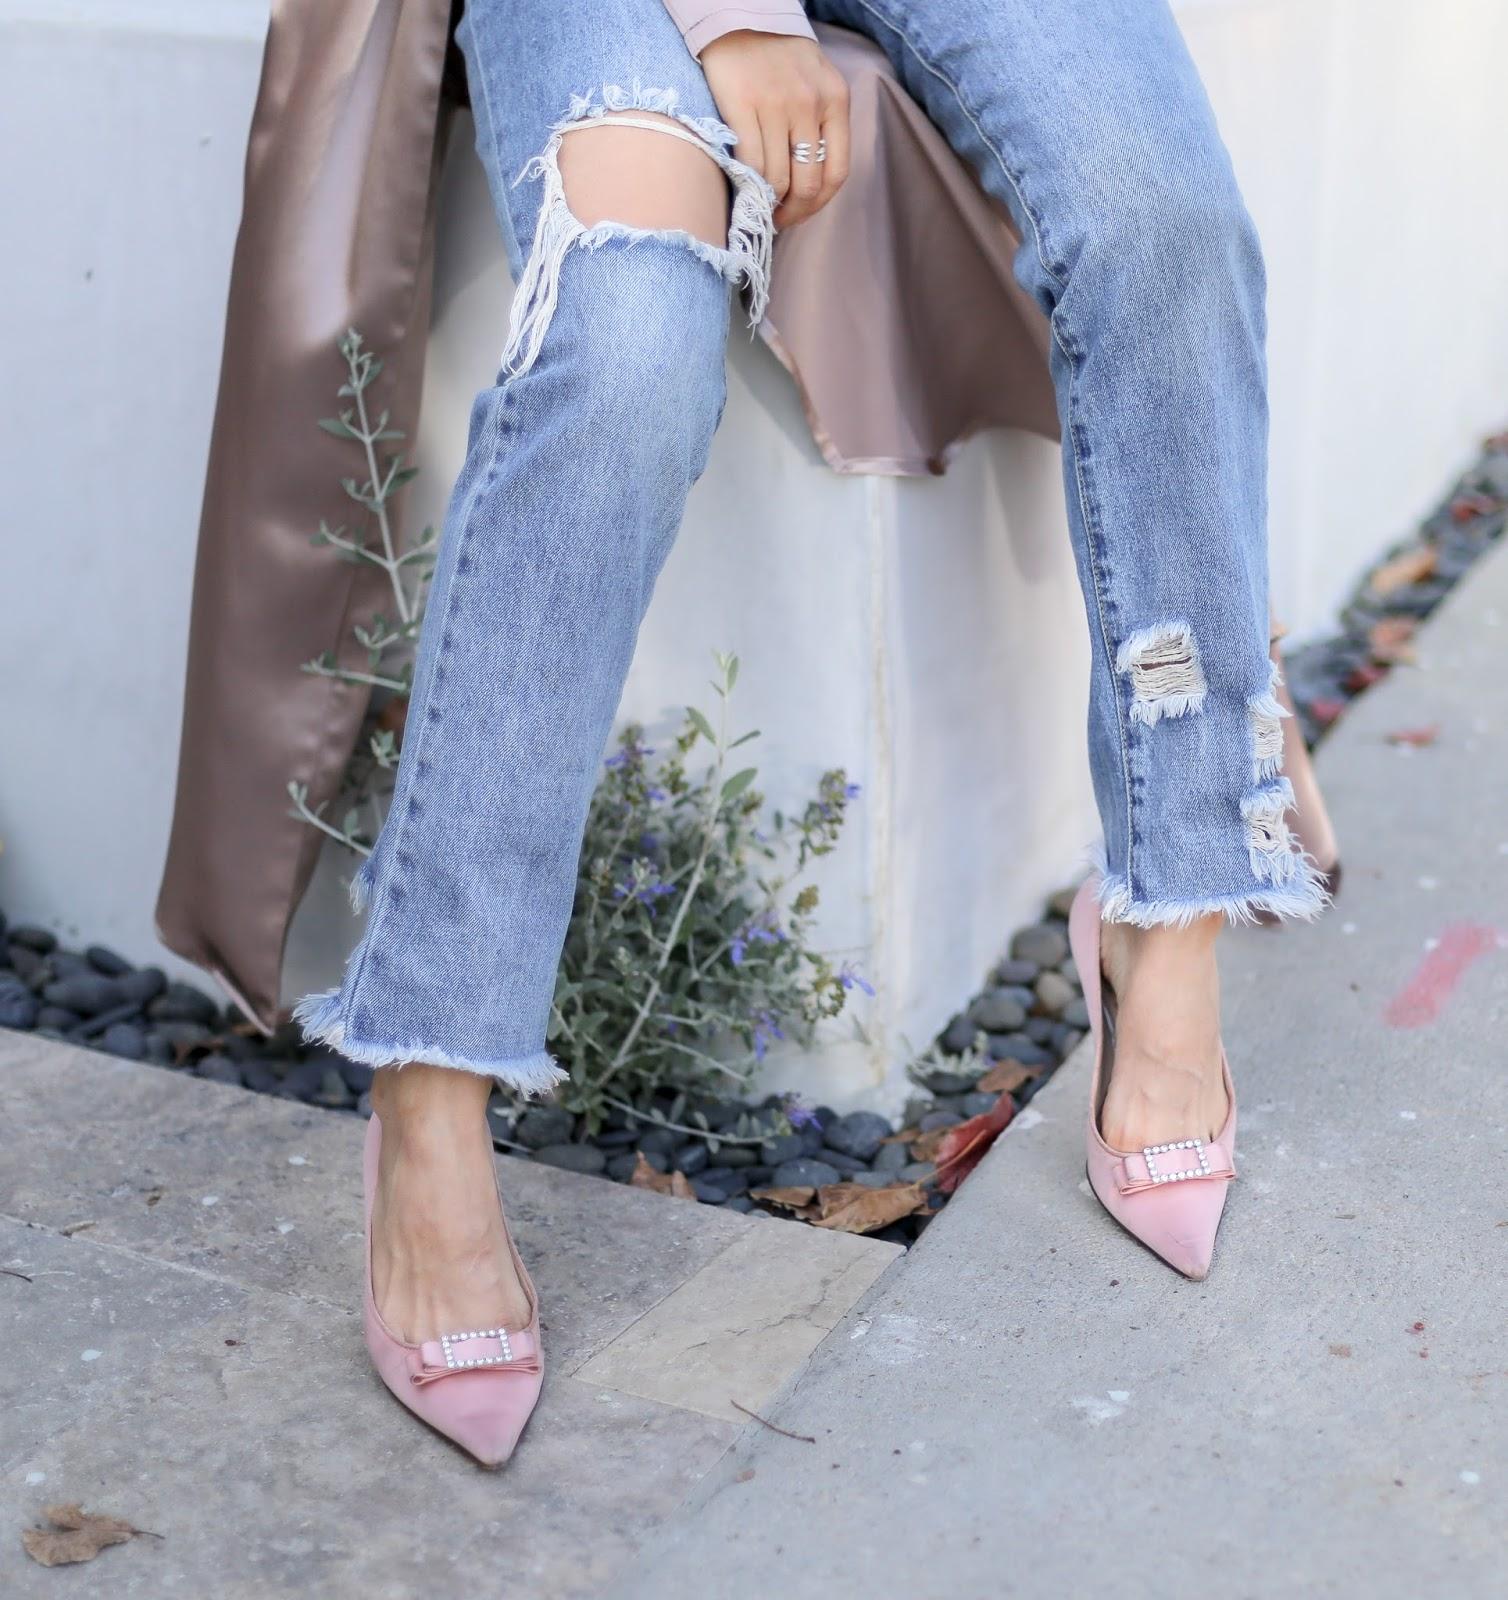 pink rhinestone kitten heels outfit